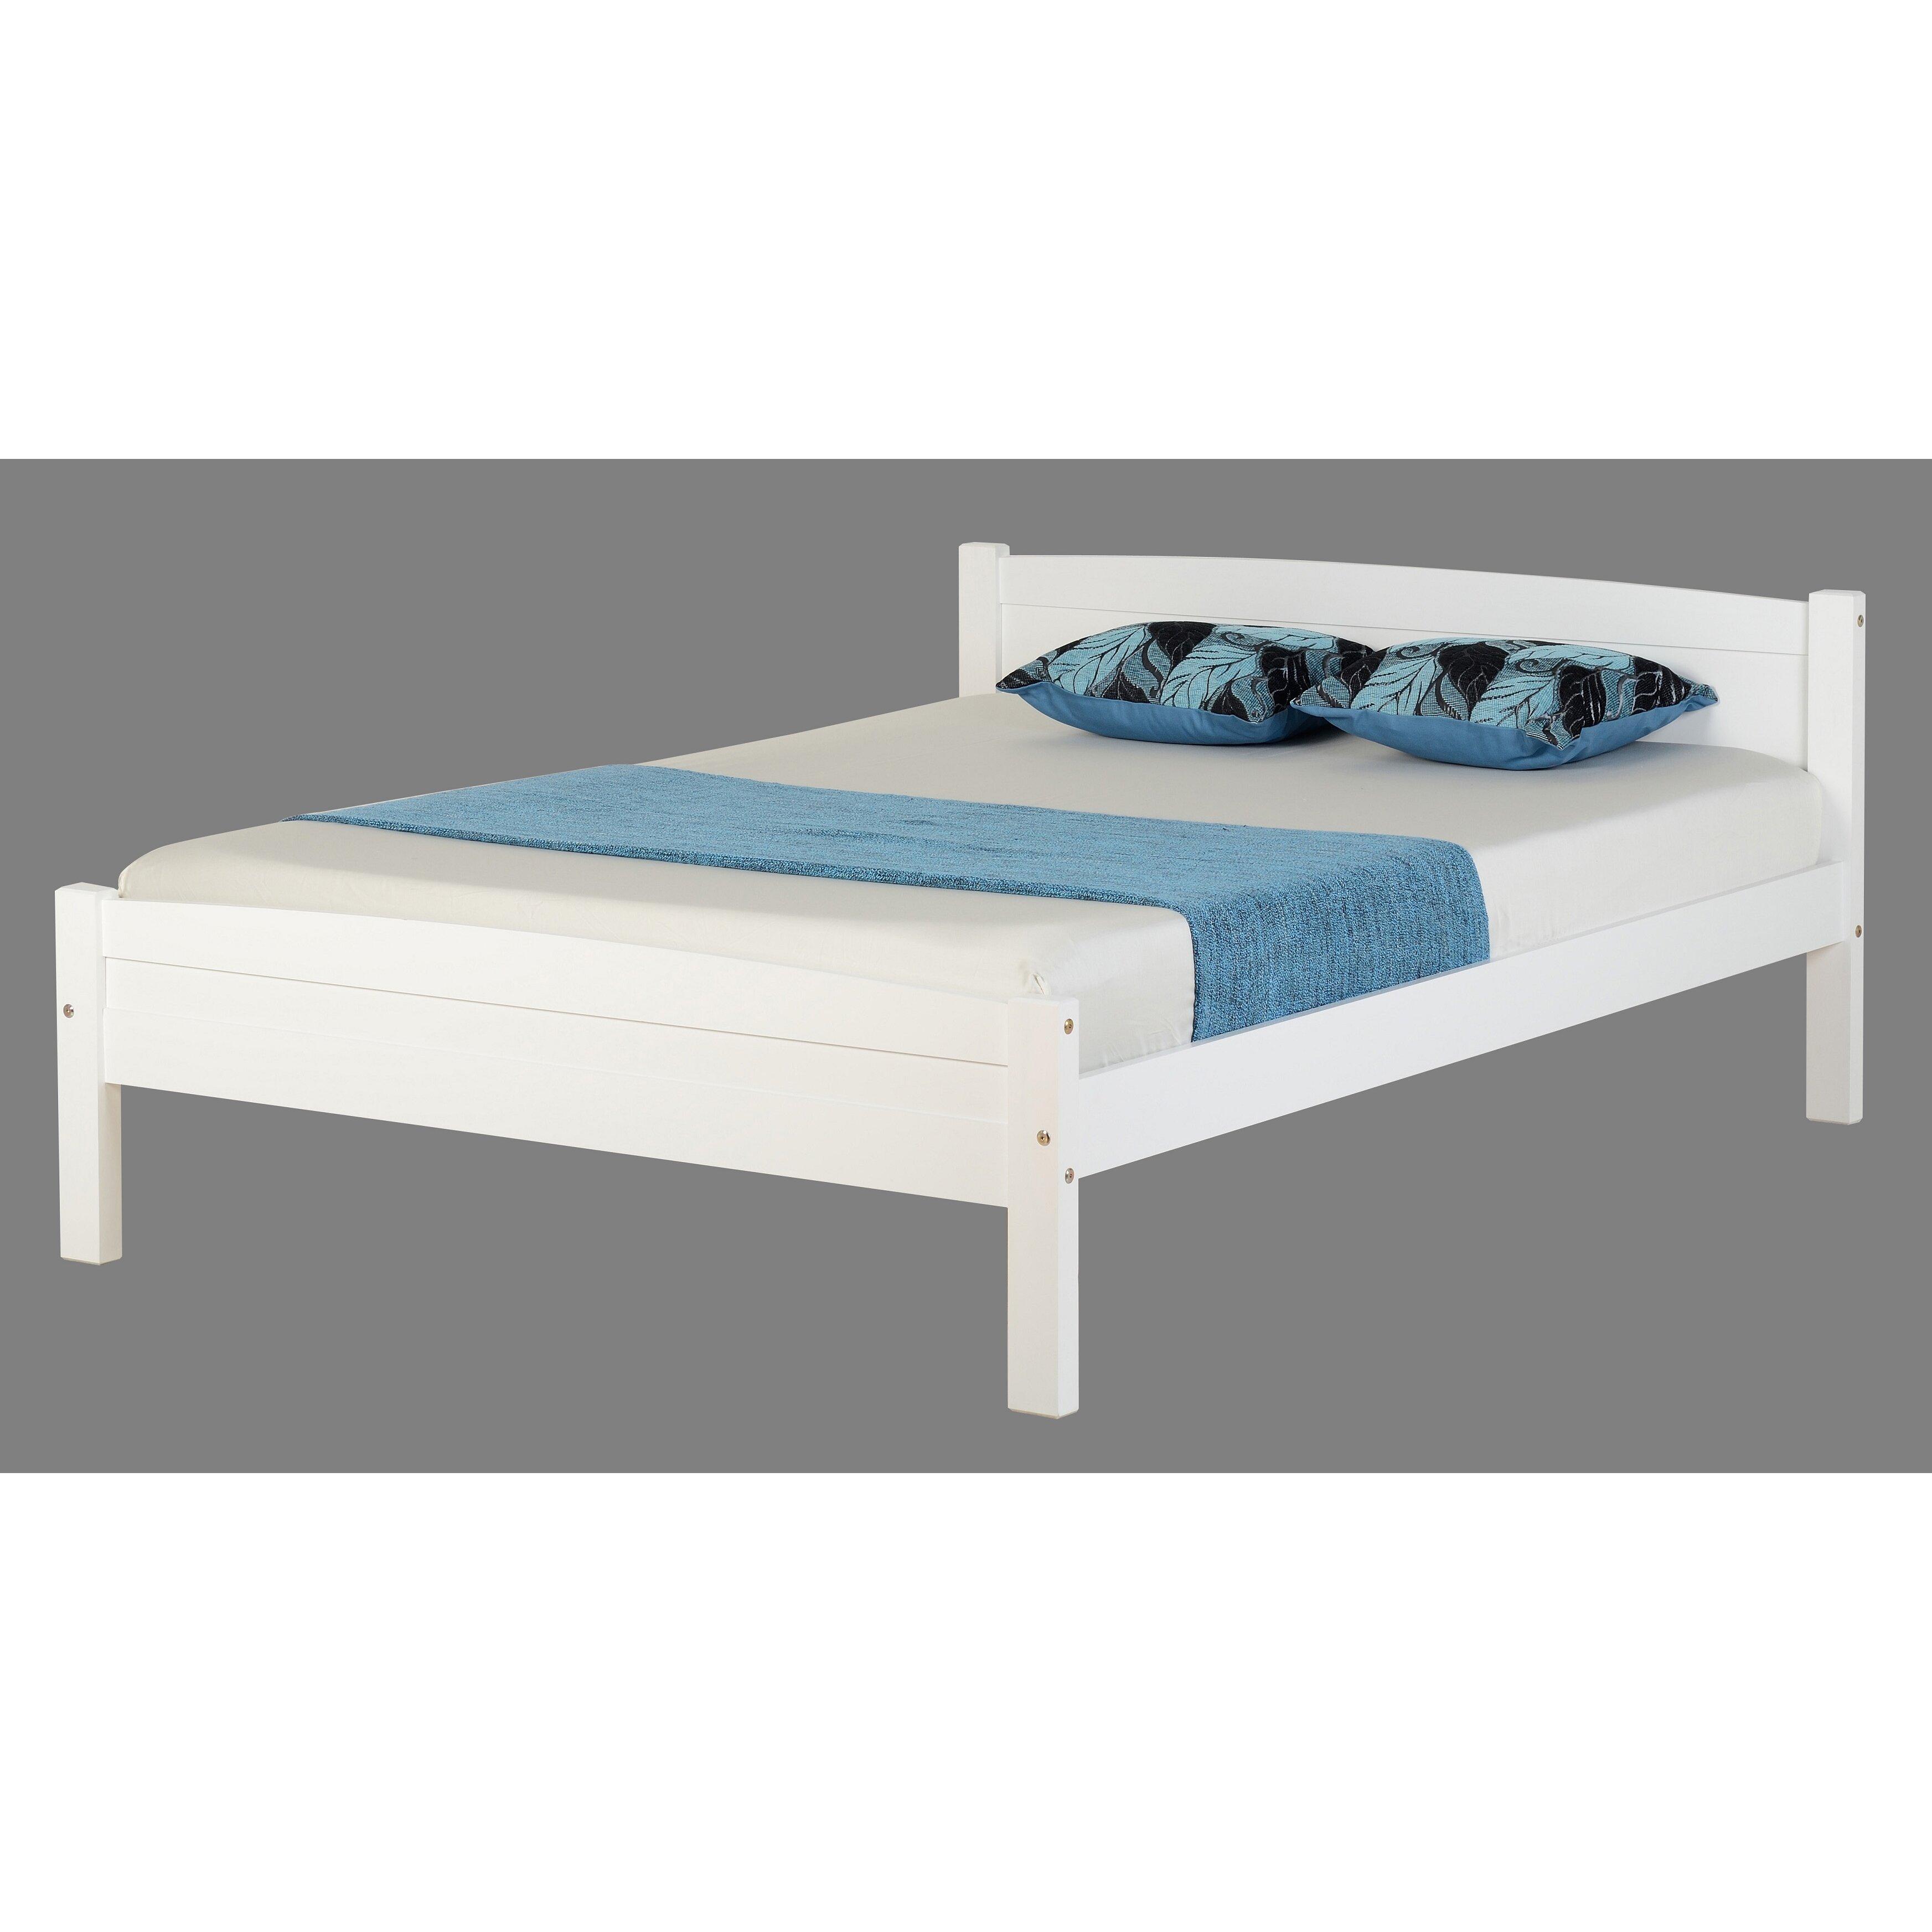 Auckland bed frame wayfair uk for Bedroom furniture auckland